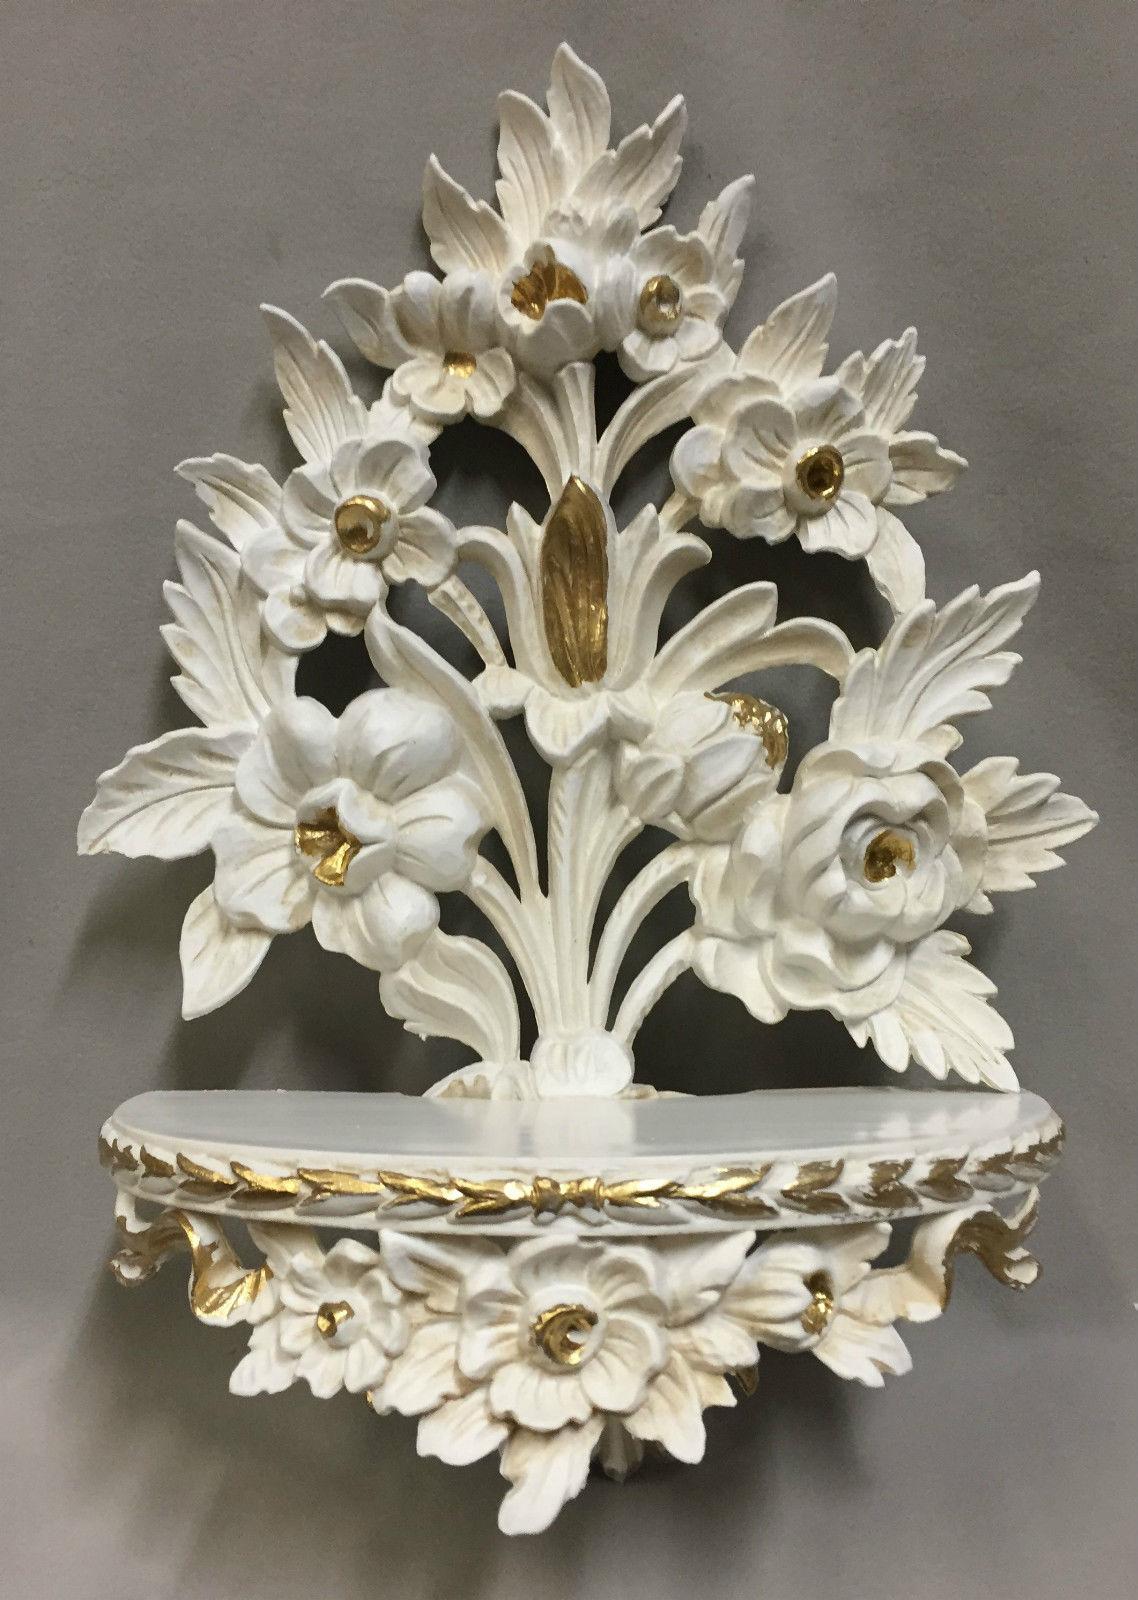 Wandkonsole Weiss Gold /Spiegelkonsolen/Wandregal BAROCK/Deko H:35 Blumen cp82